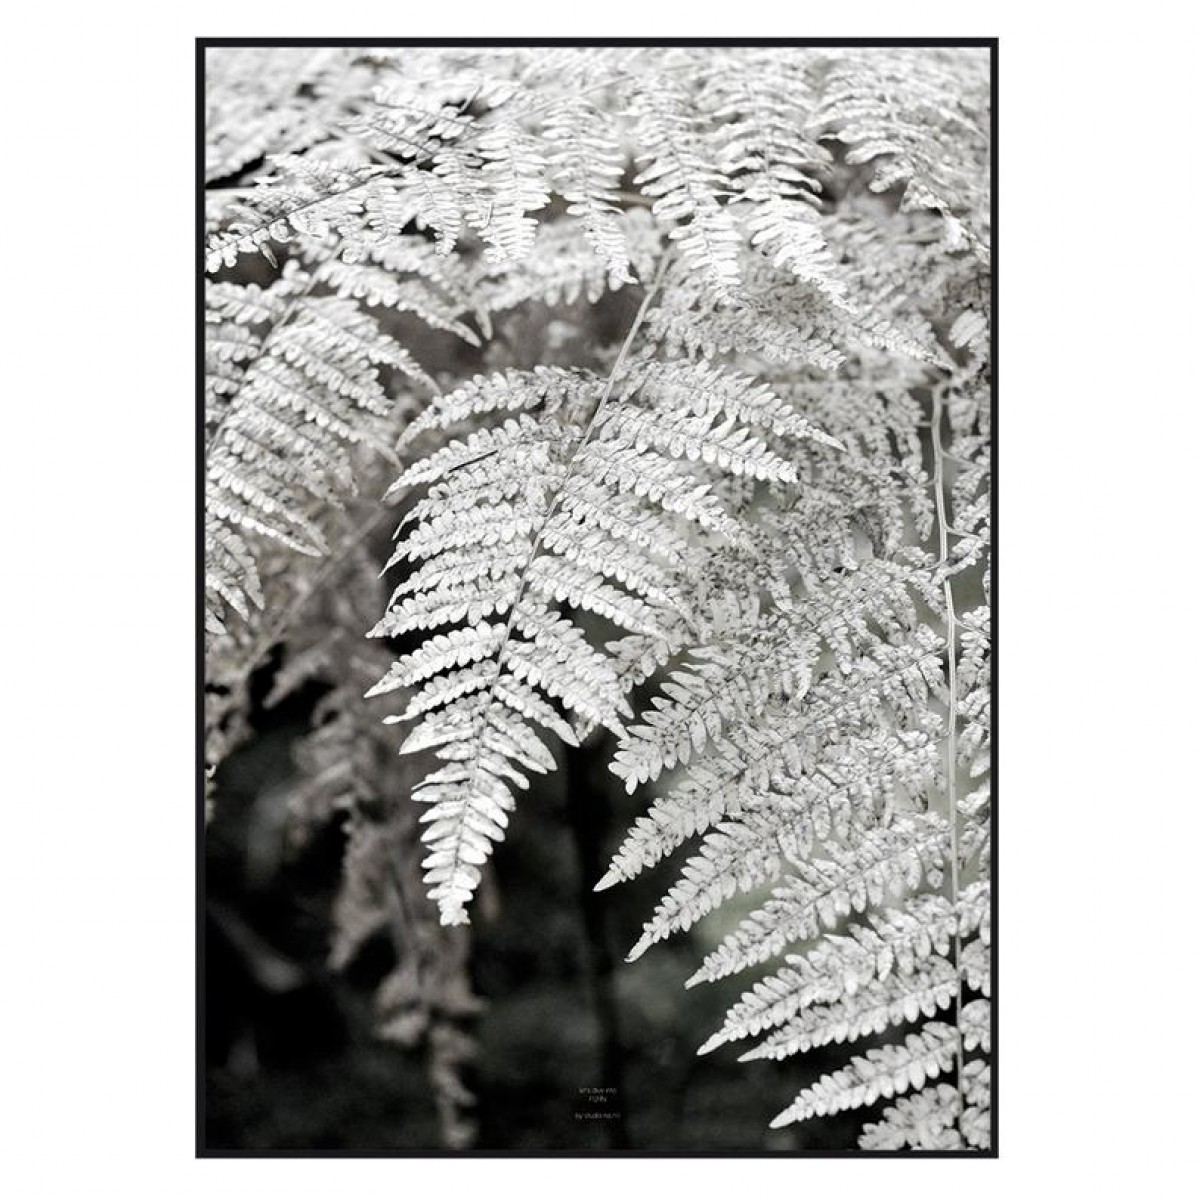 "nahili ARTPRINT / POSTER ""let´s dive into FERN"" schwarz weiß Farn Pflanzen Fotografie - Druck (DIN A1/A3 & 50x70cm)"